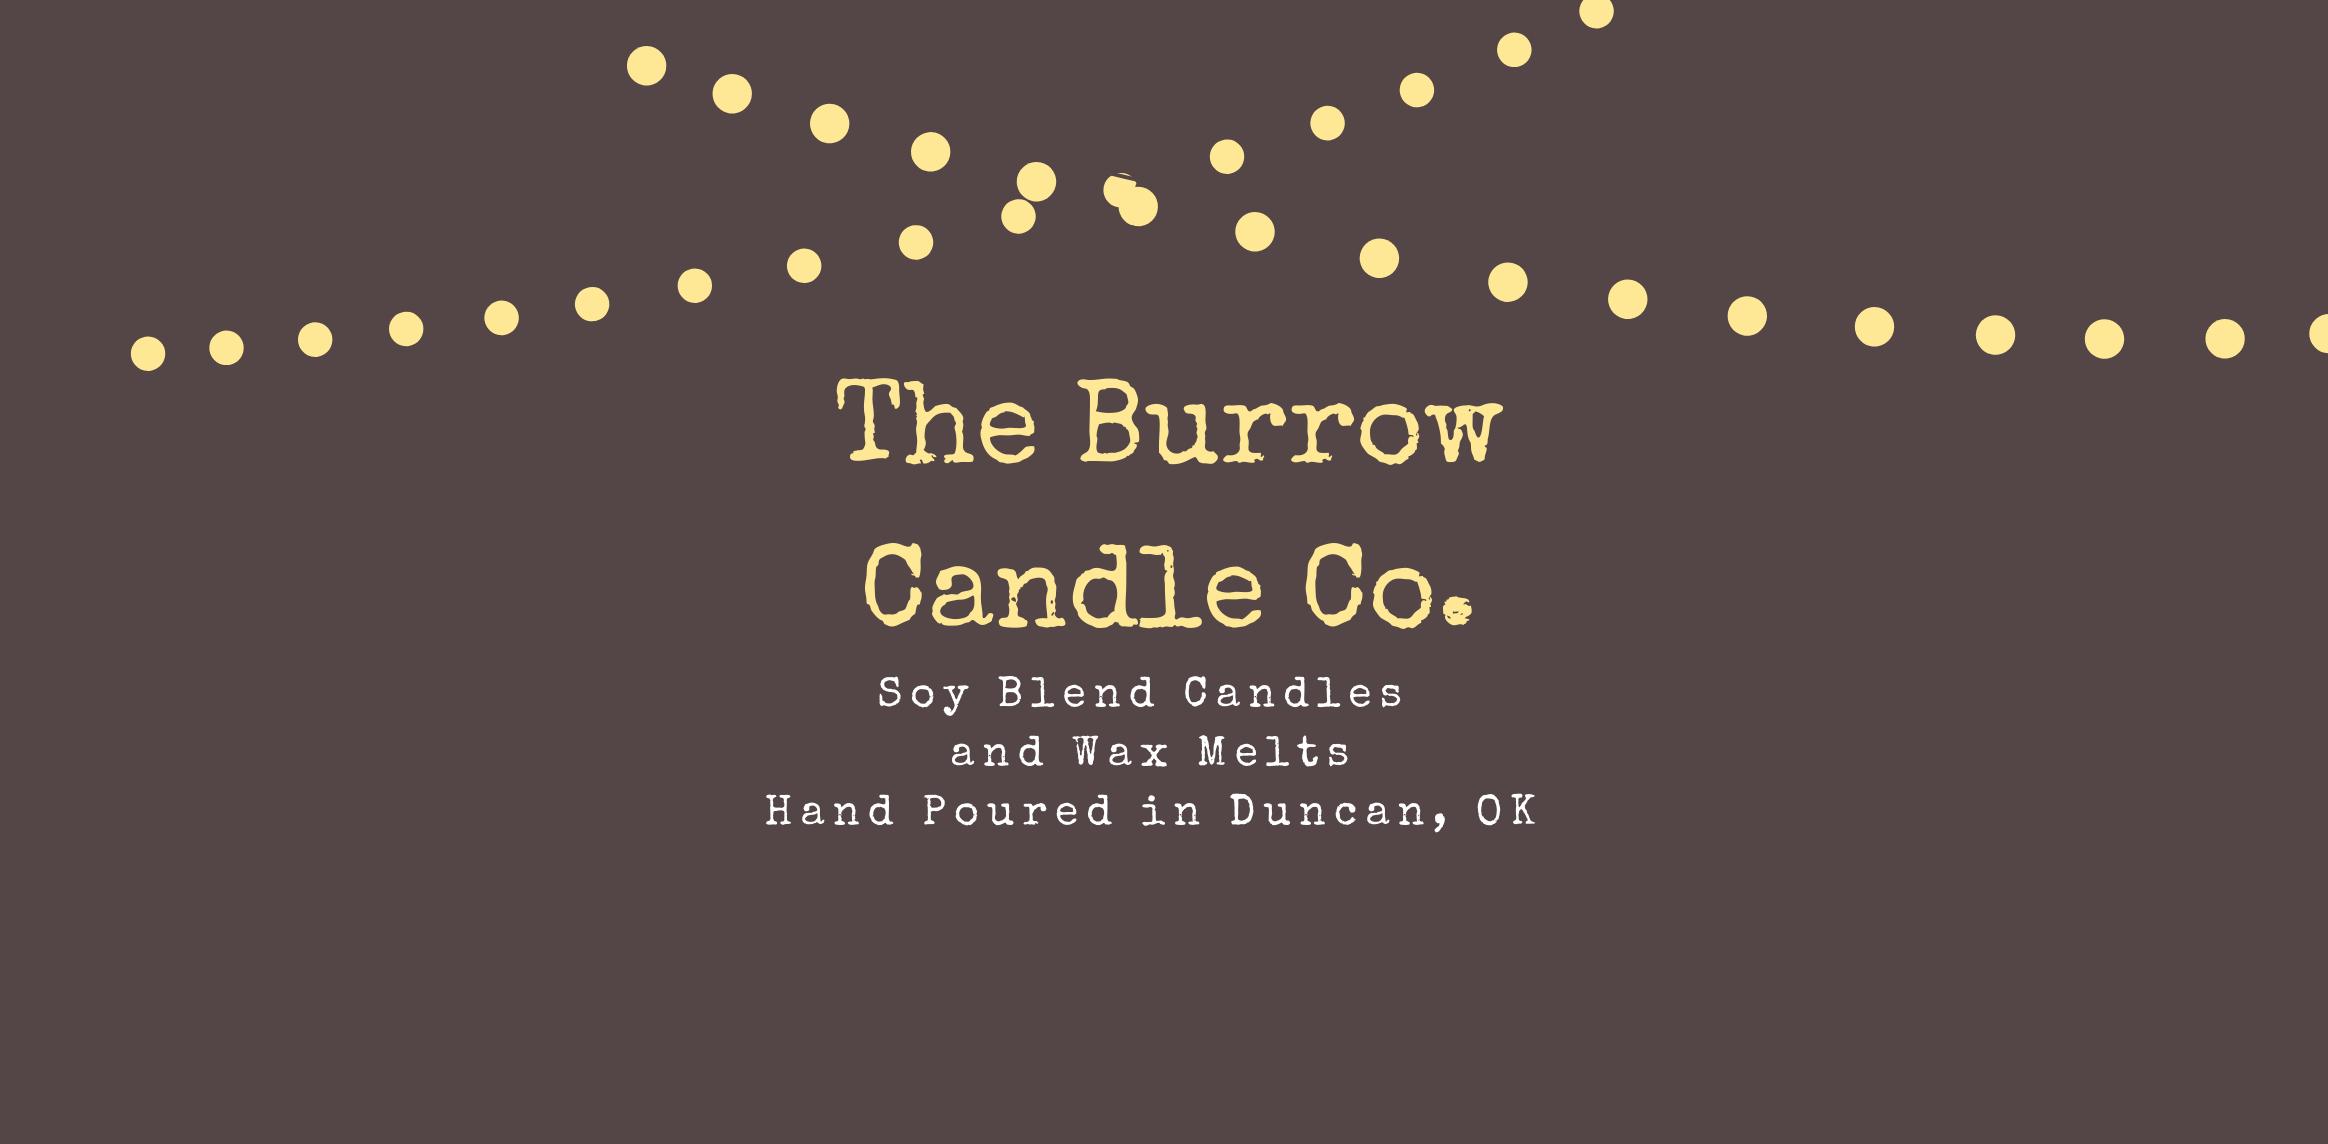 The Burrow Candle Company